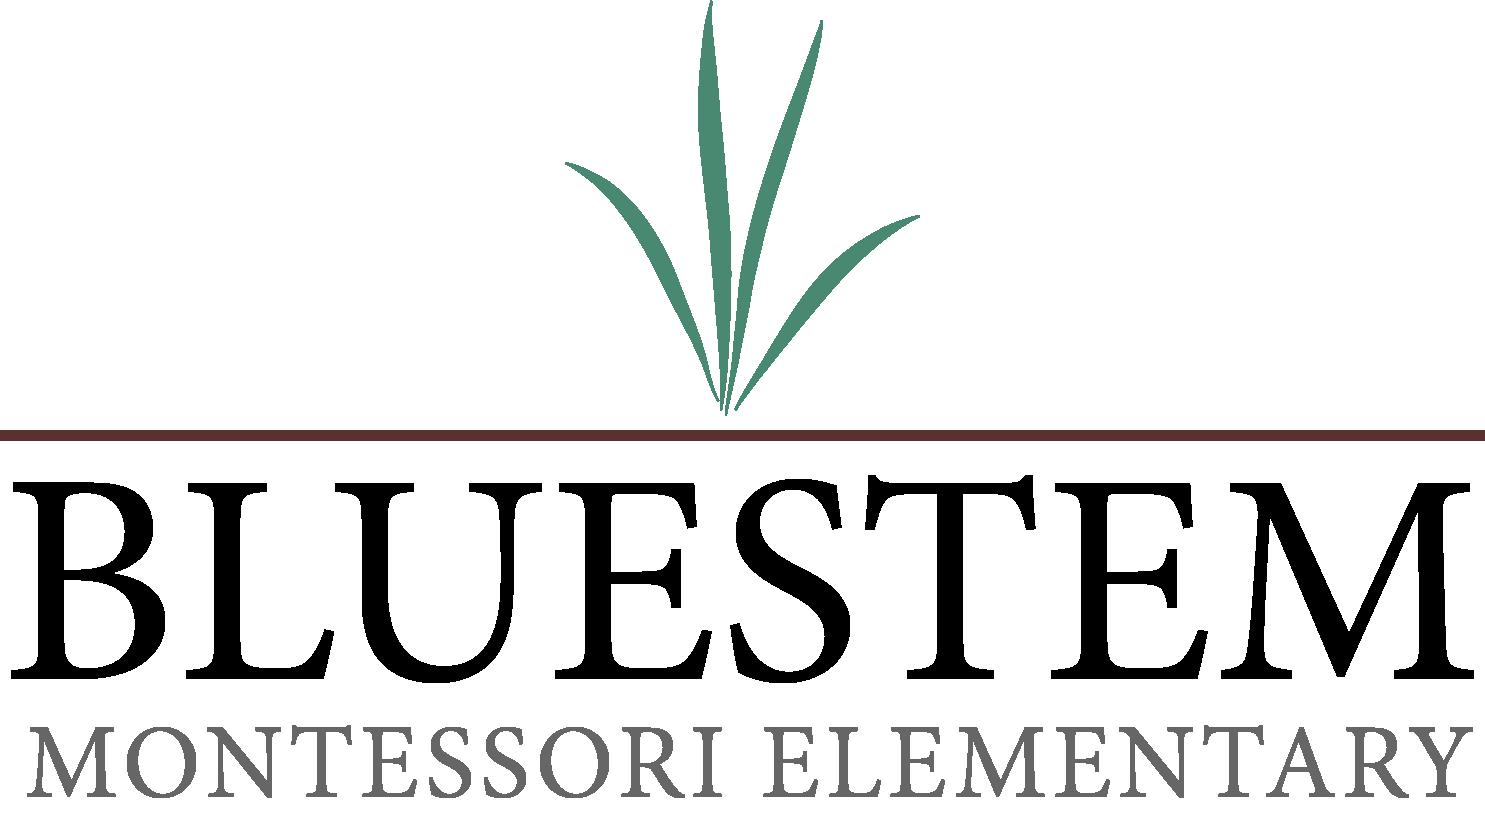 Bluestem Montessori Elementary